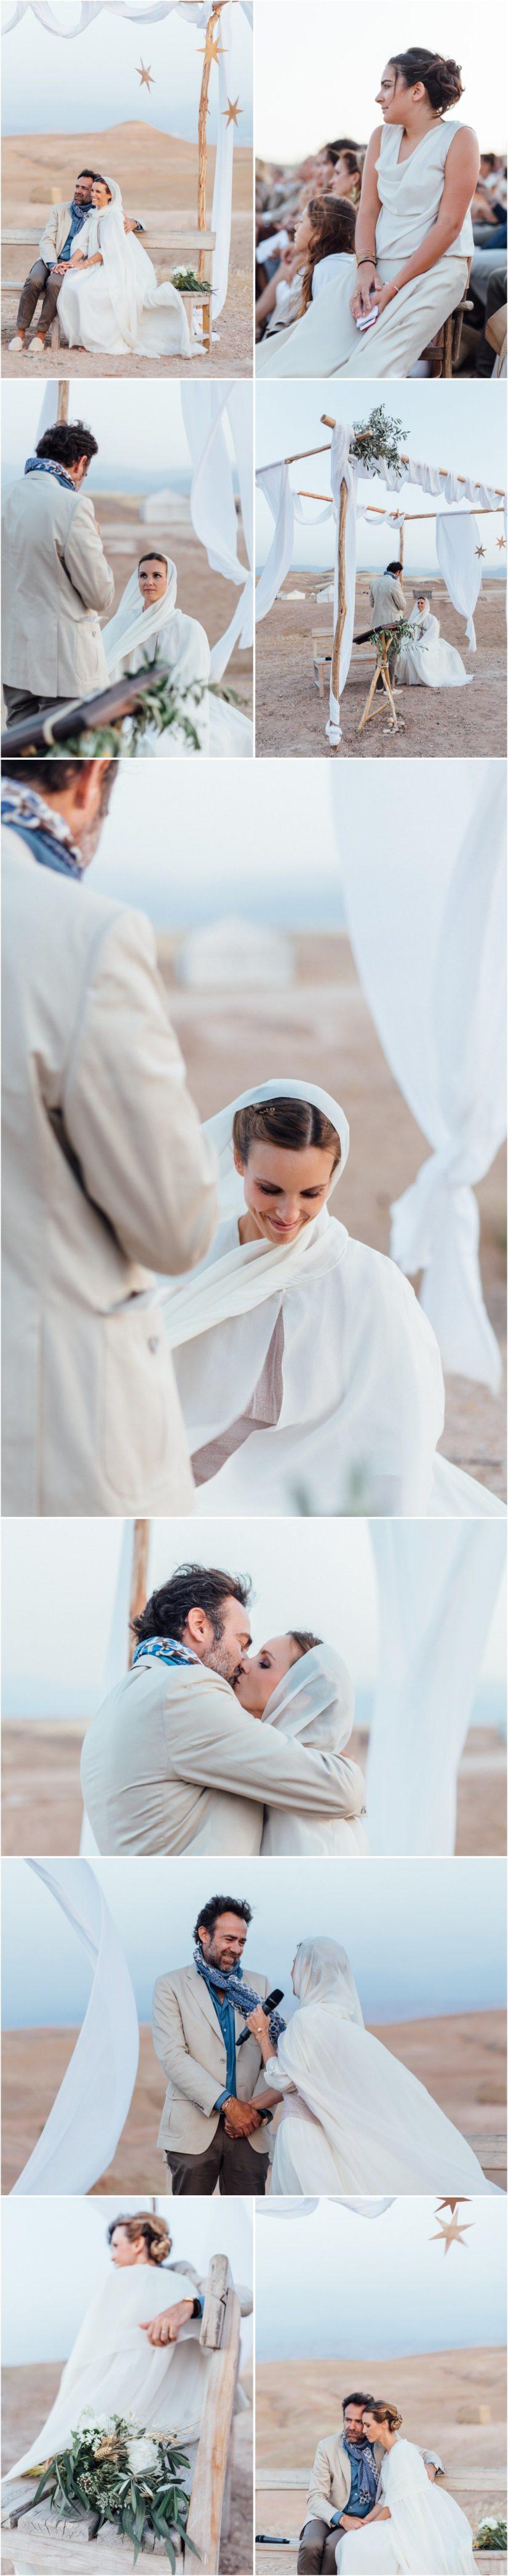 Photographe mariage Essaouira 11